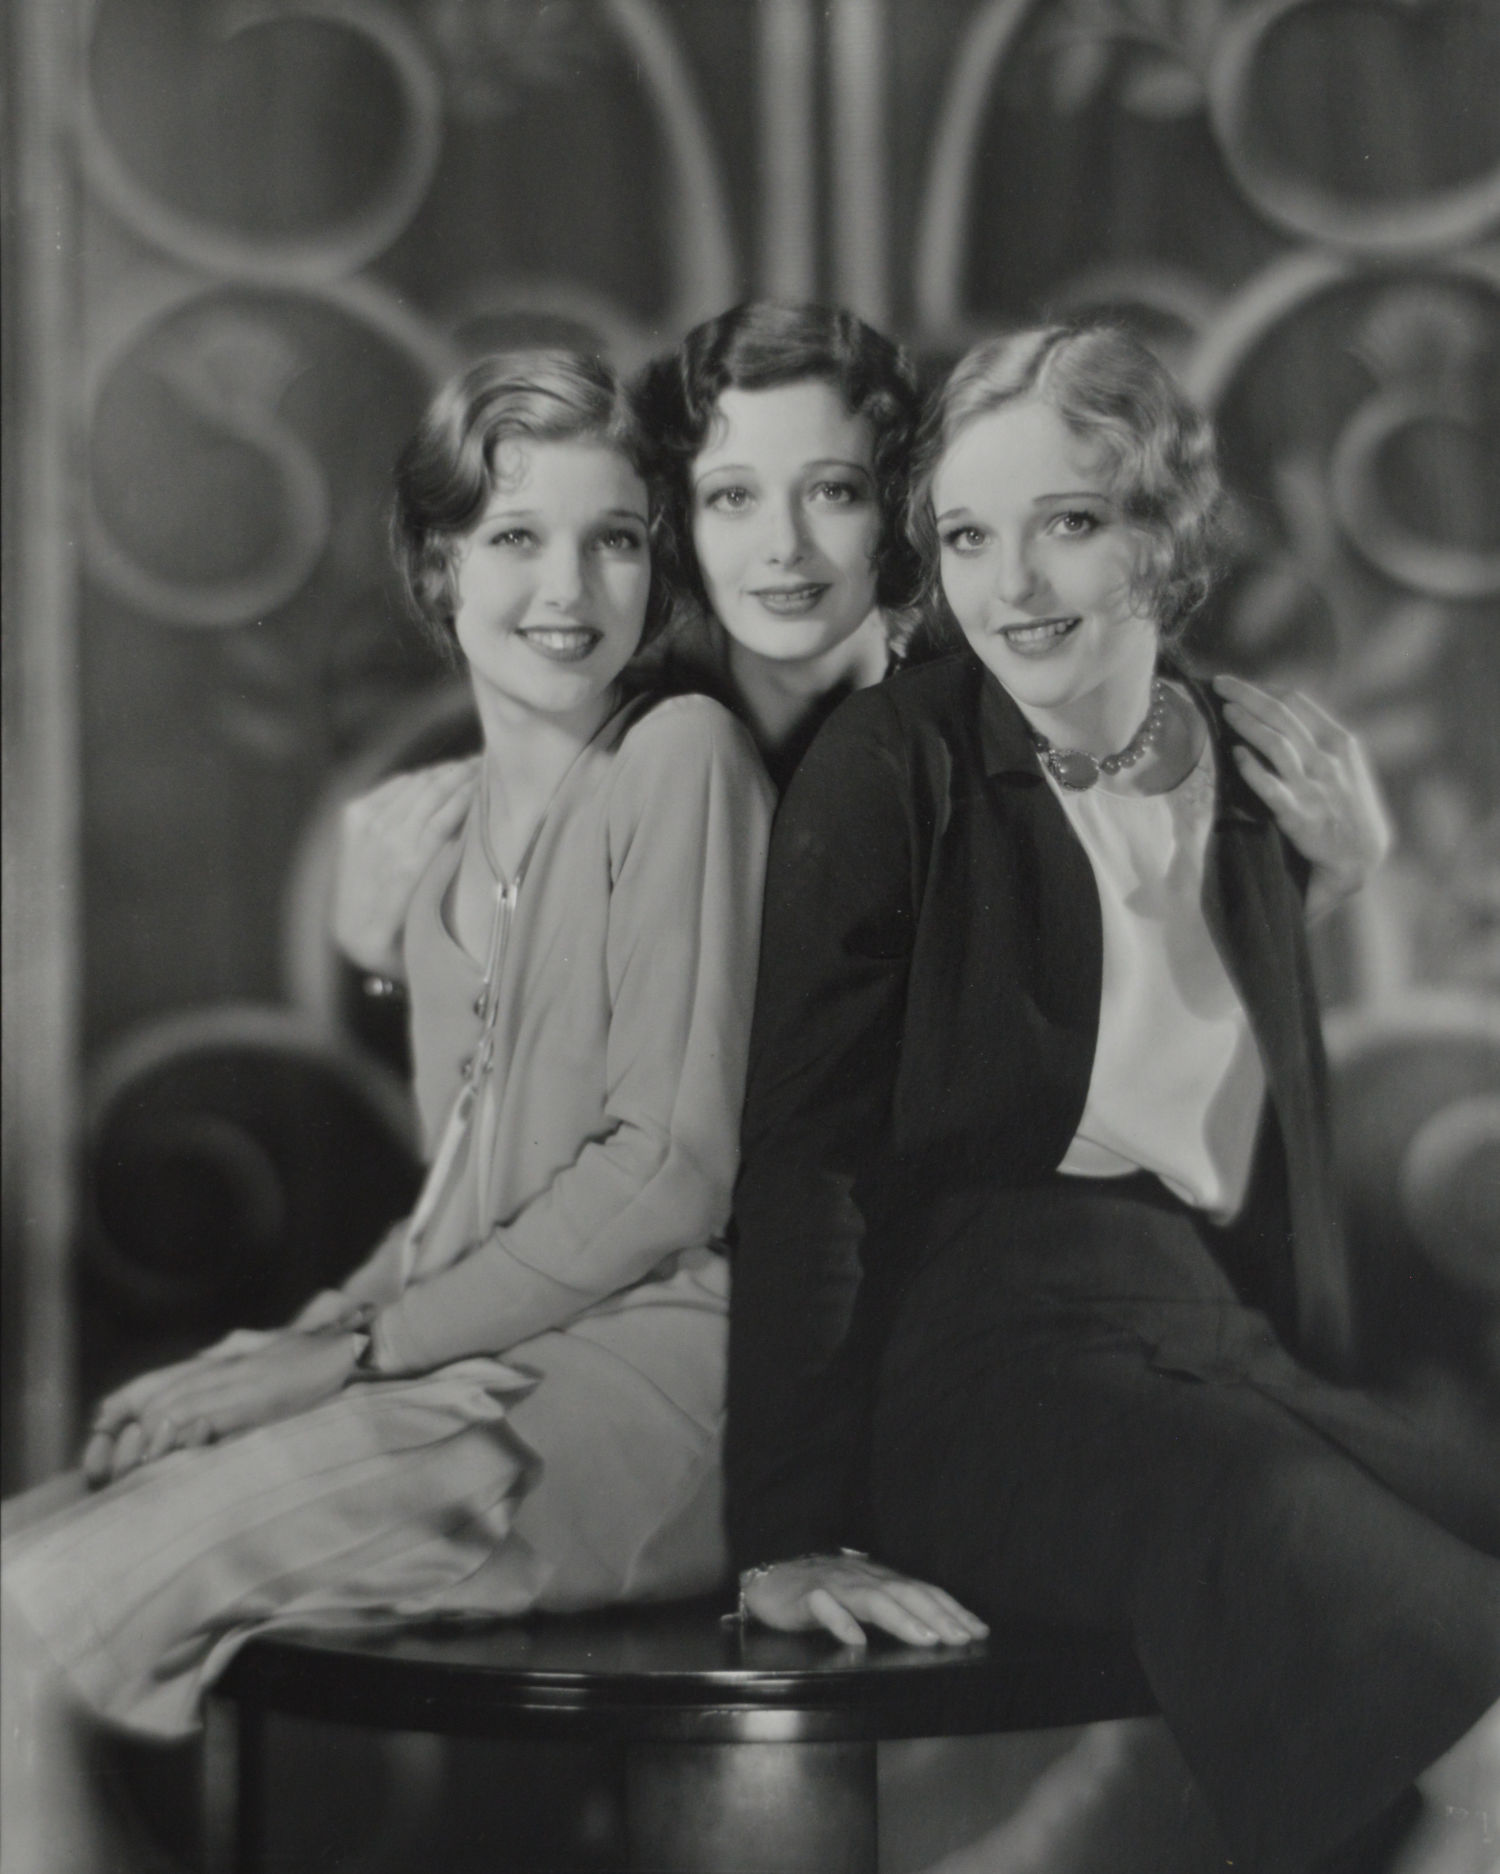 Muray - Loretta Young & Sisters.jpg